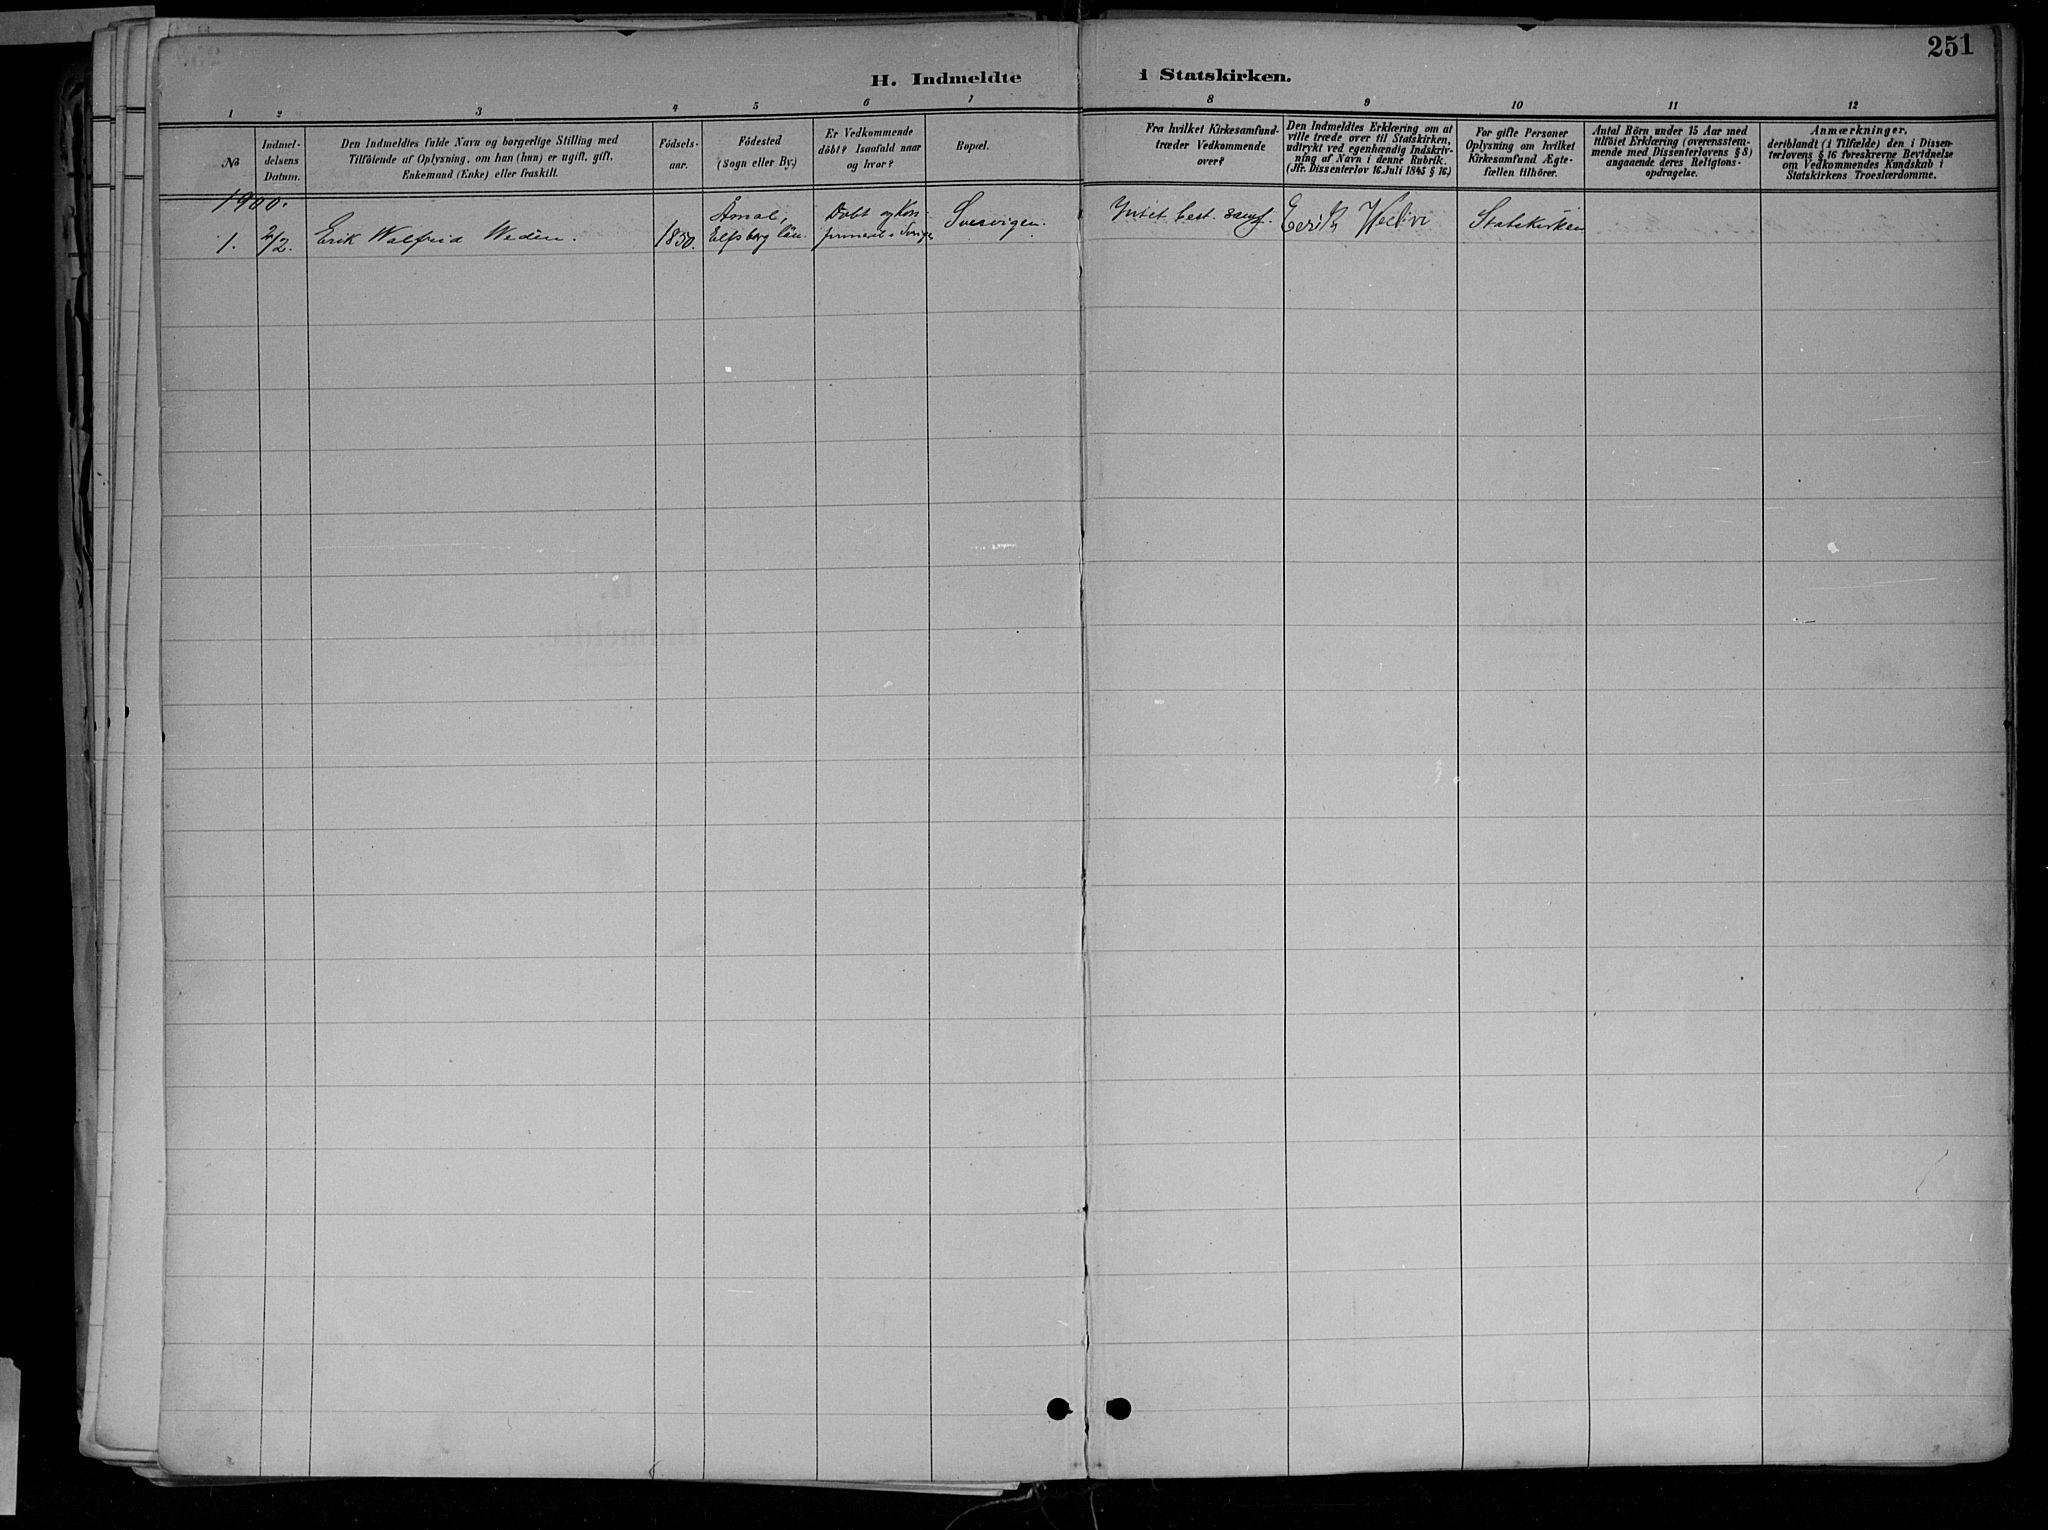 SAH, Jevnaker prestekontor, Ministerialbok nr. 10, 1891-1906, s. 251